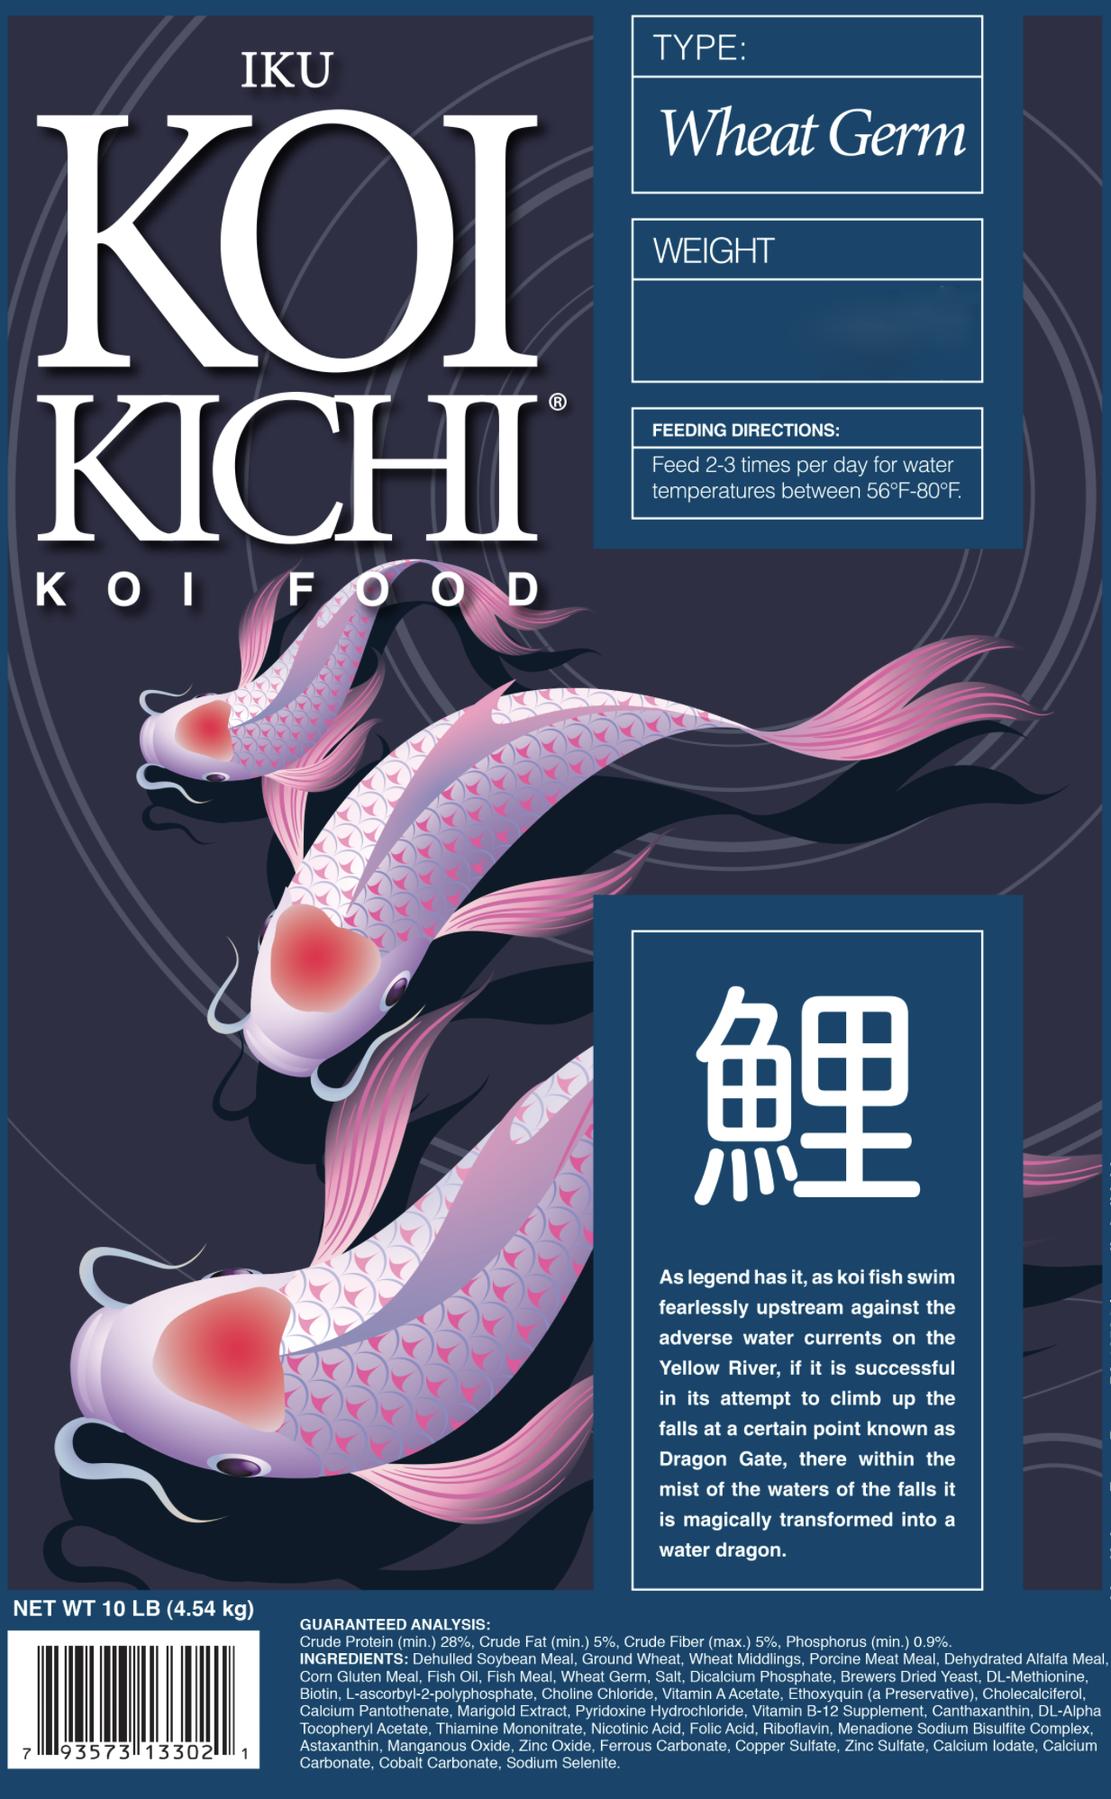 Iku Koi Kichi Wheat Germ Koi Fish Food - 20 lbs.